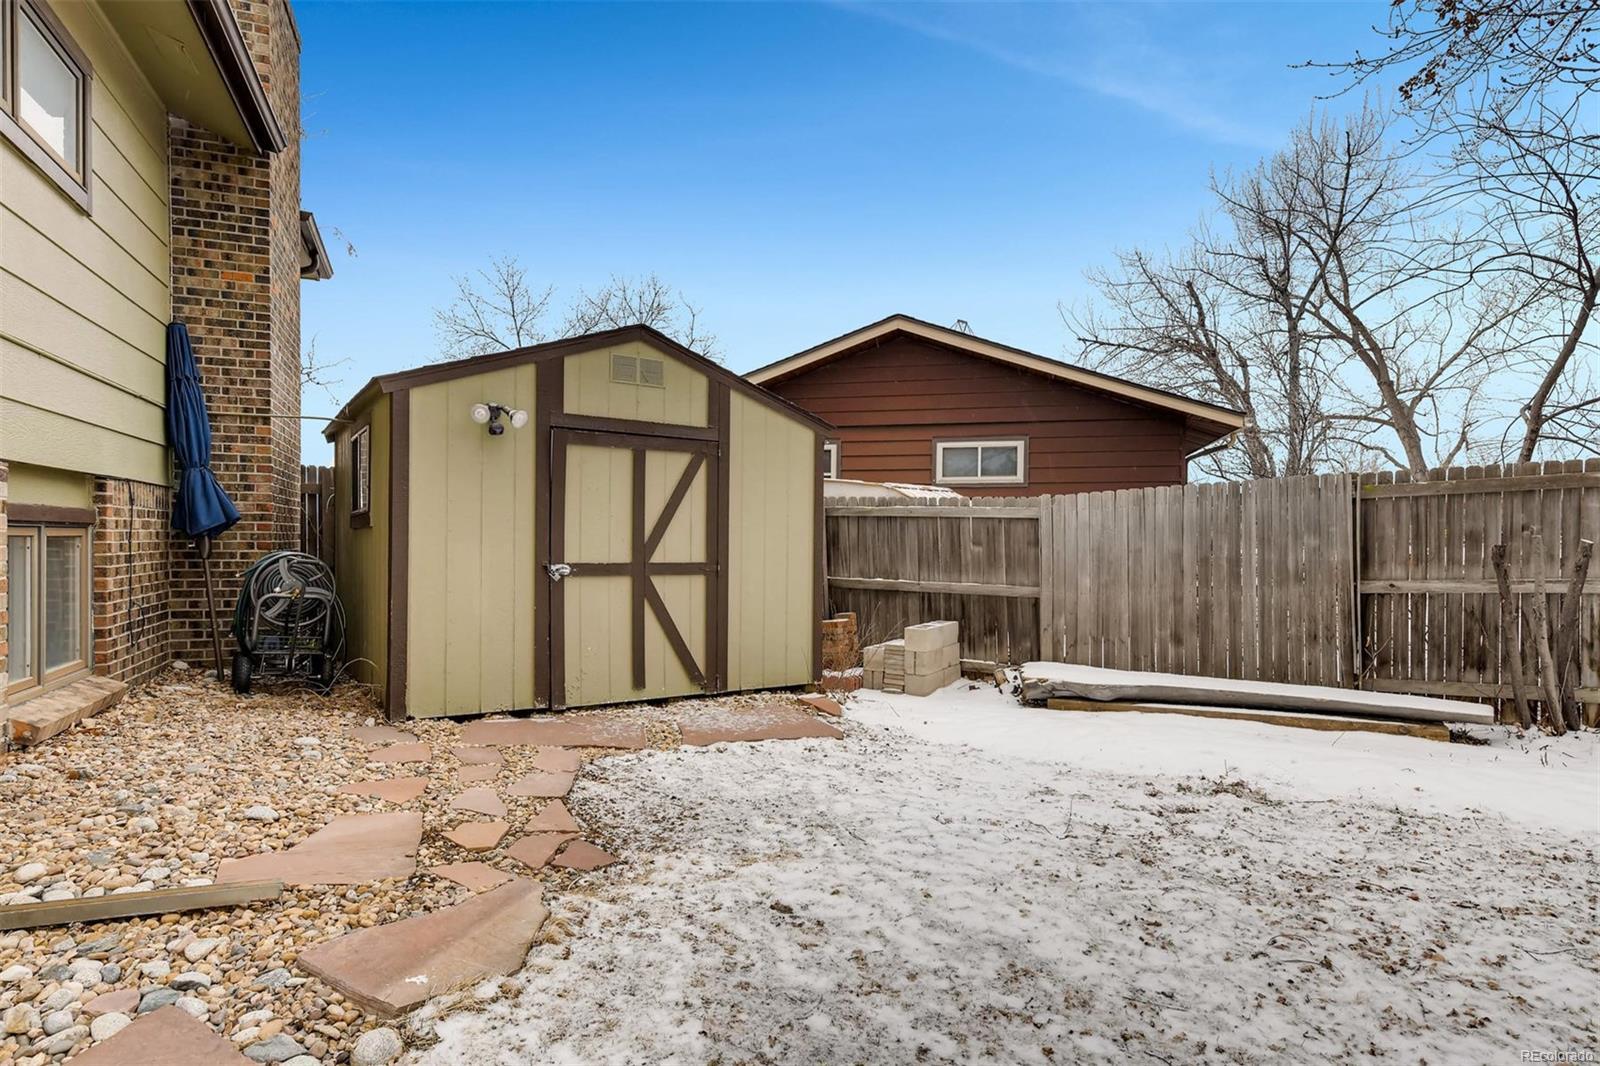 More Backyard Storage In 2nd Storage/Utility Shed!